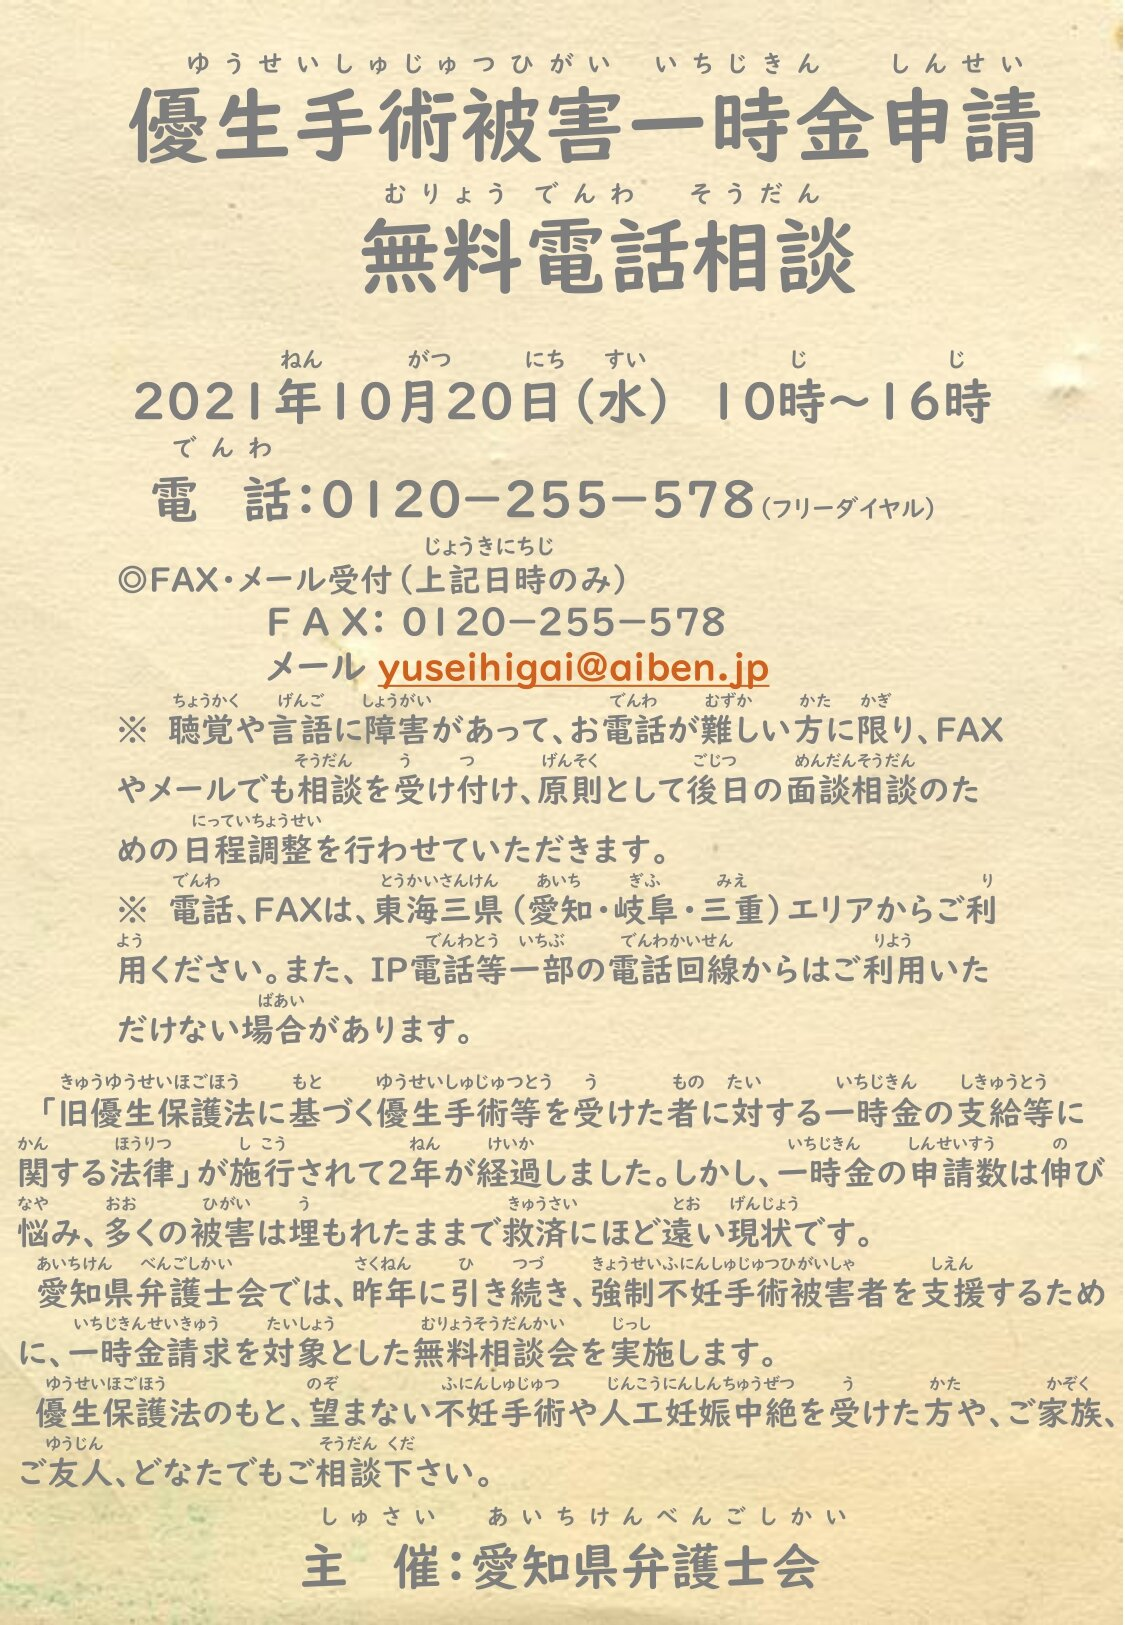 210914 優生手術被害一時金申請電話相談チラシ_page-0001.jpg